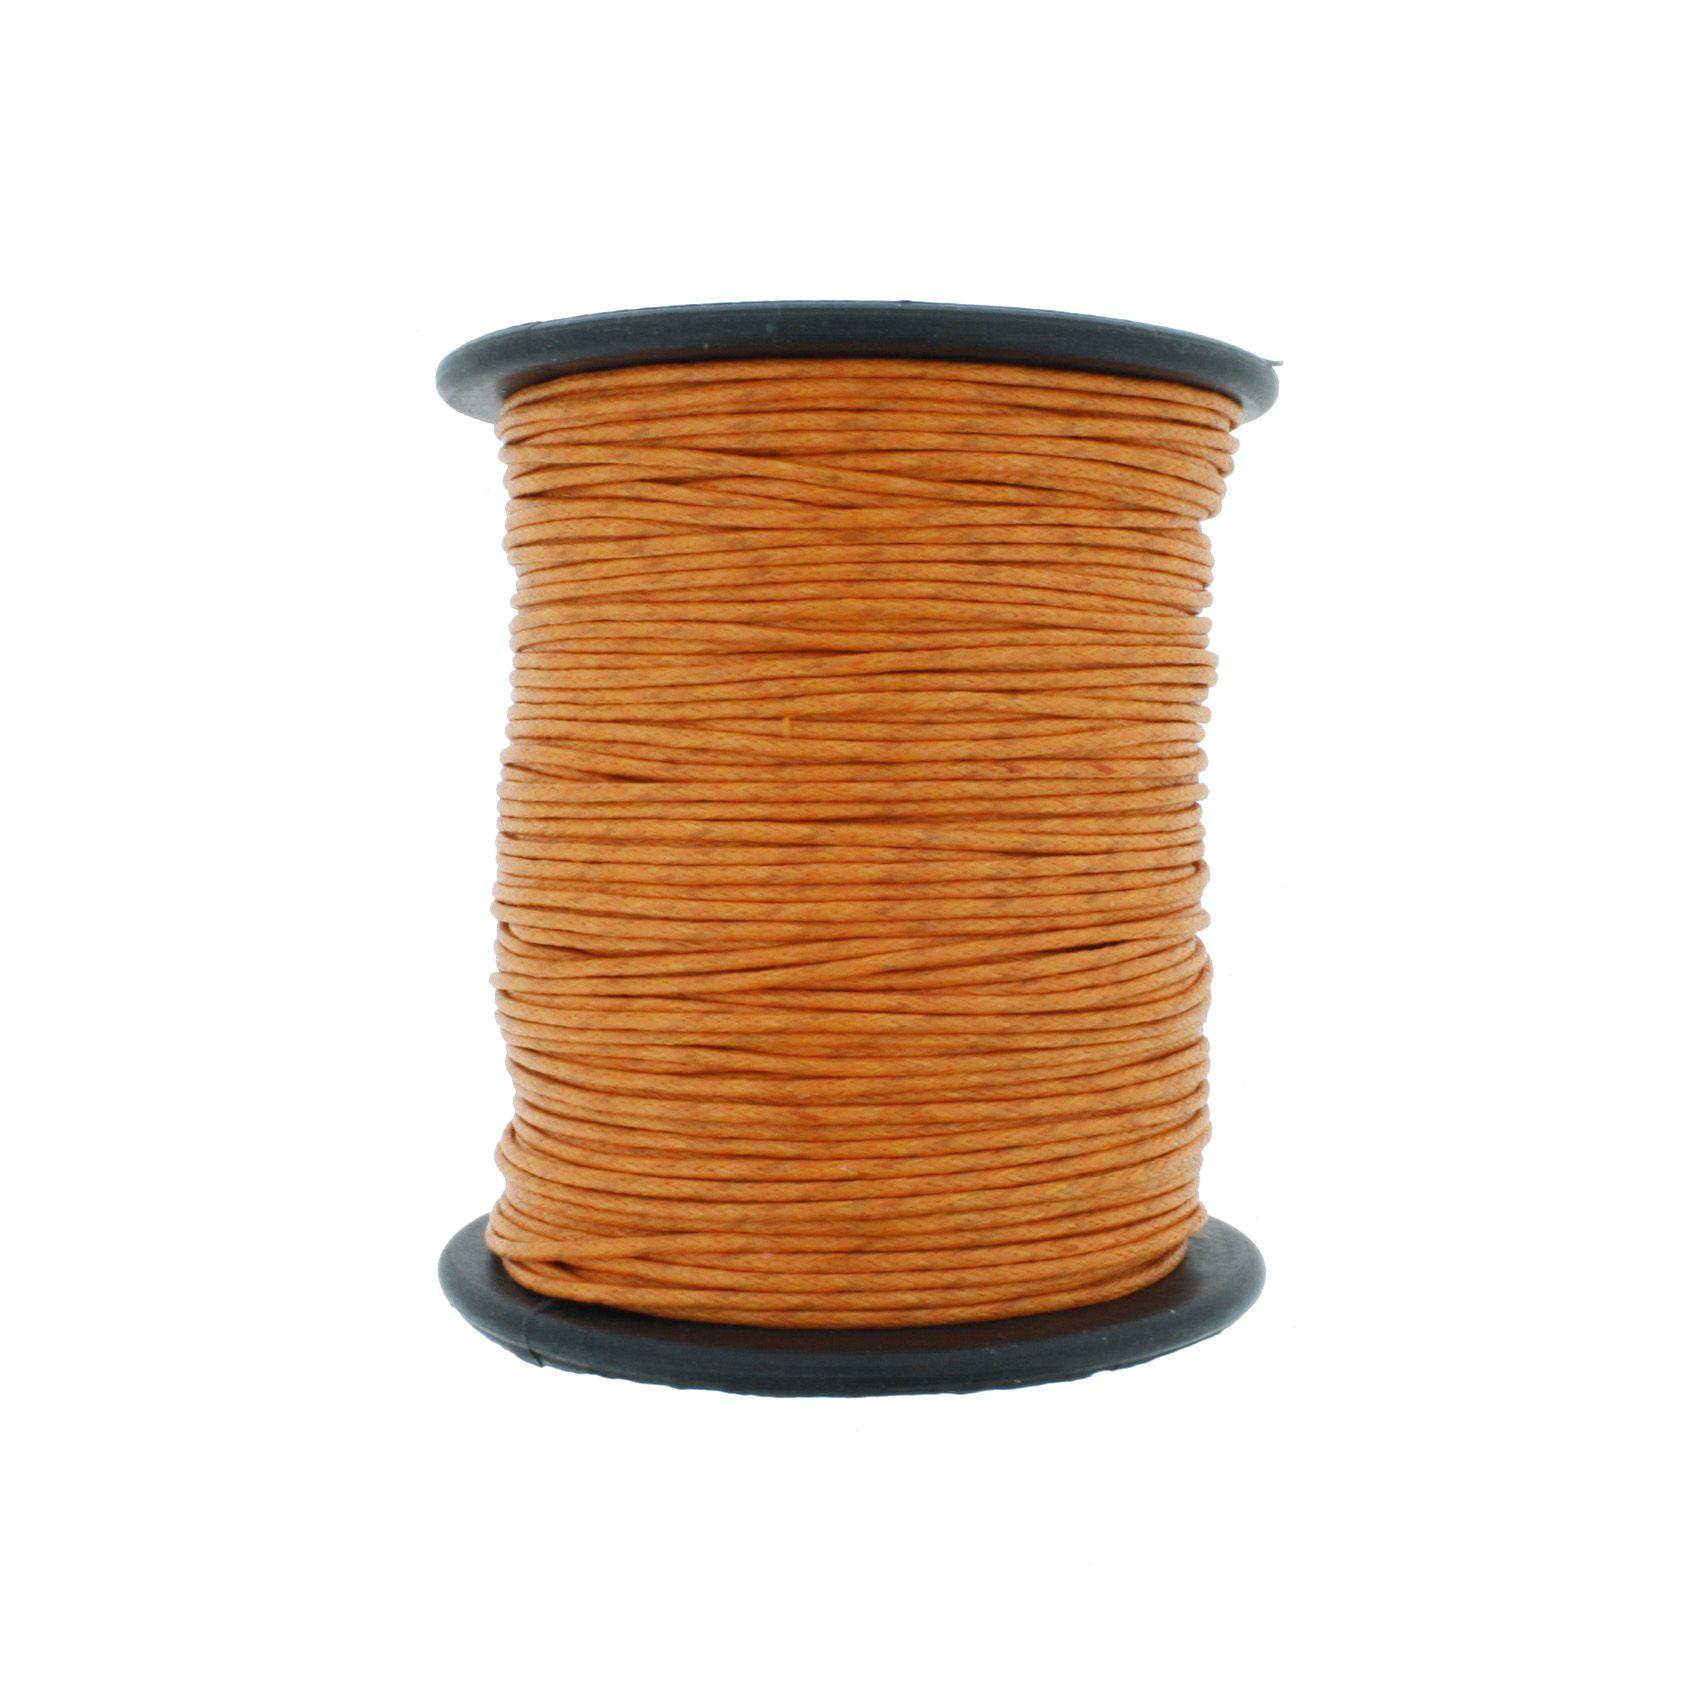 Cordão Encerado - Work® - Laranja - 1mm  - Stéphanie Bijoux® - Peças para Bijuterias e Artesanato